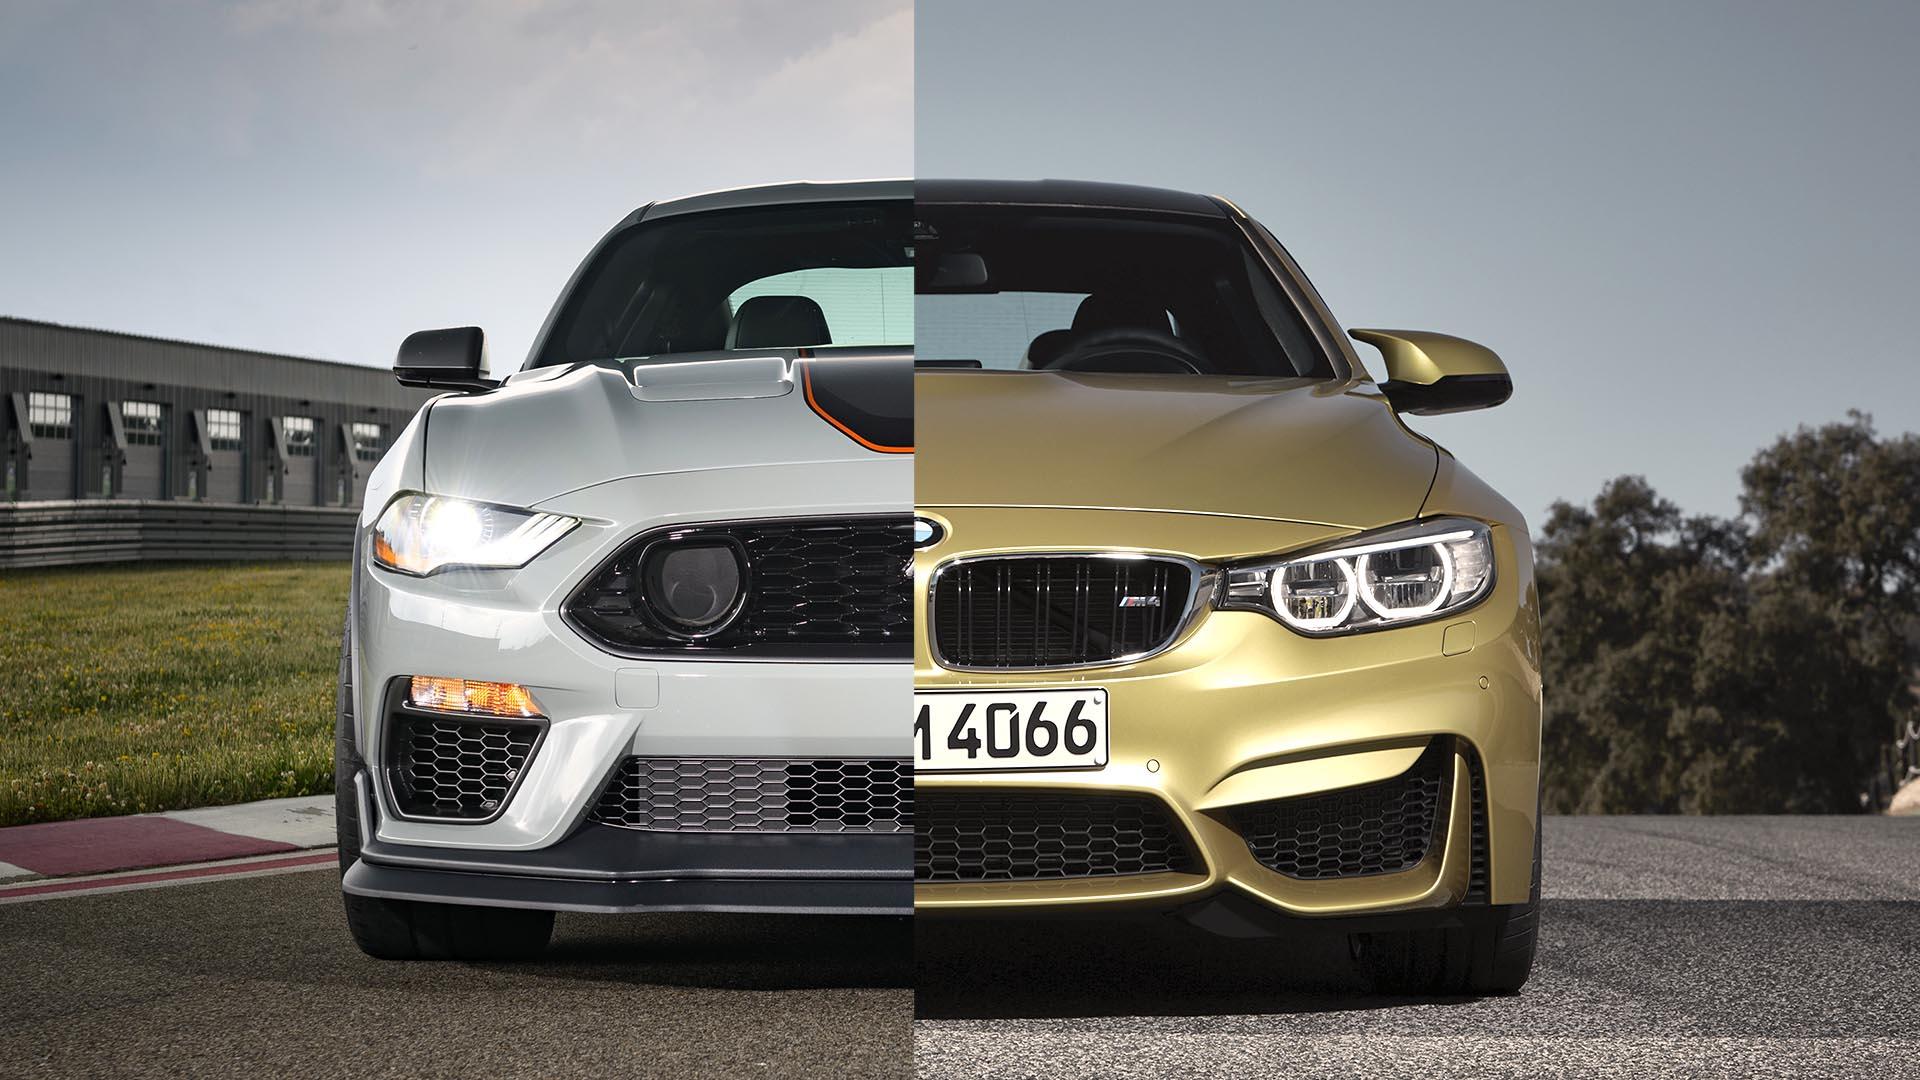 Doppelgängers - European Cars & Their American Counterparts